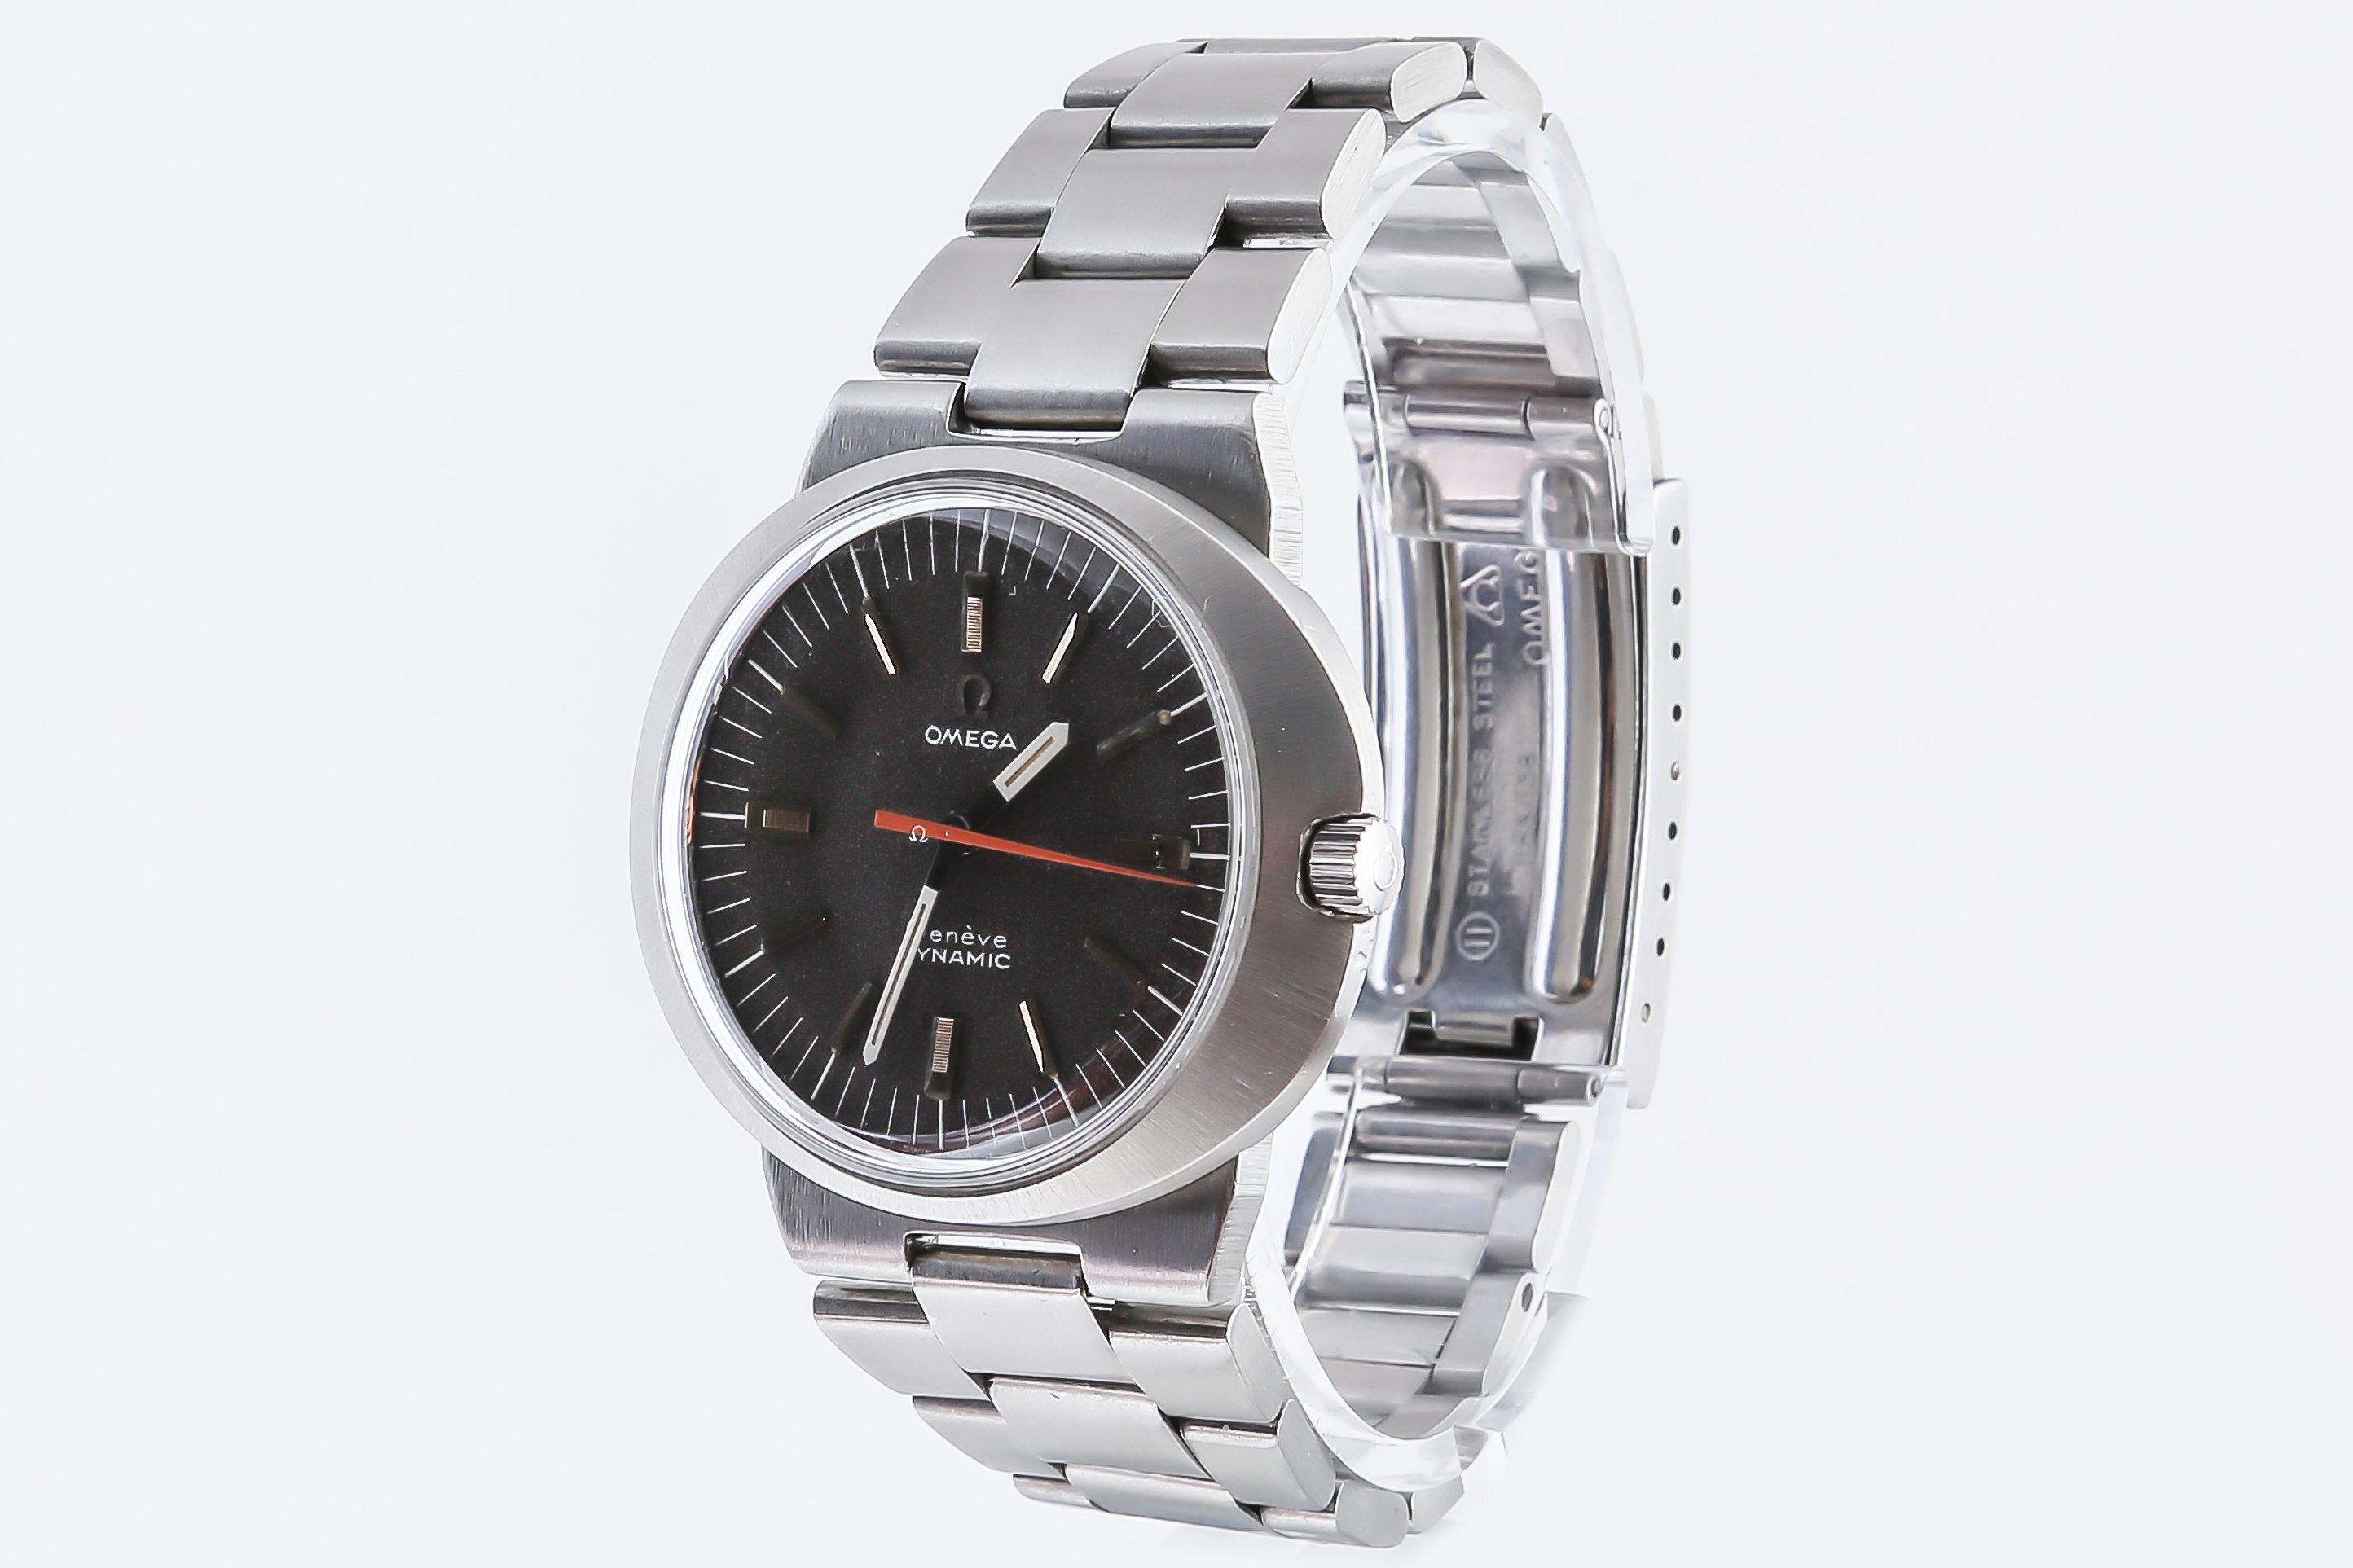 date de sortie: 1eaf9 17c75 Omega Geneve Dynamic - Maunder Watch Co.